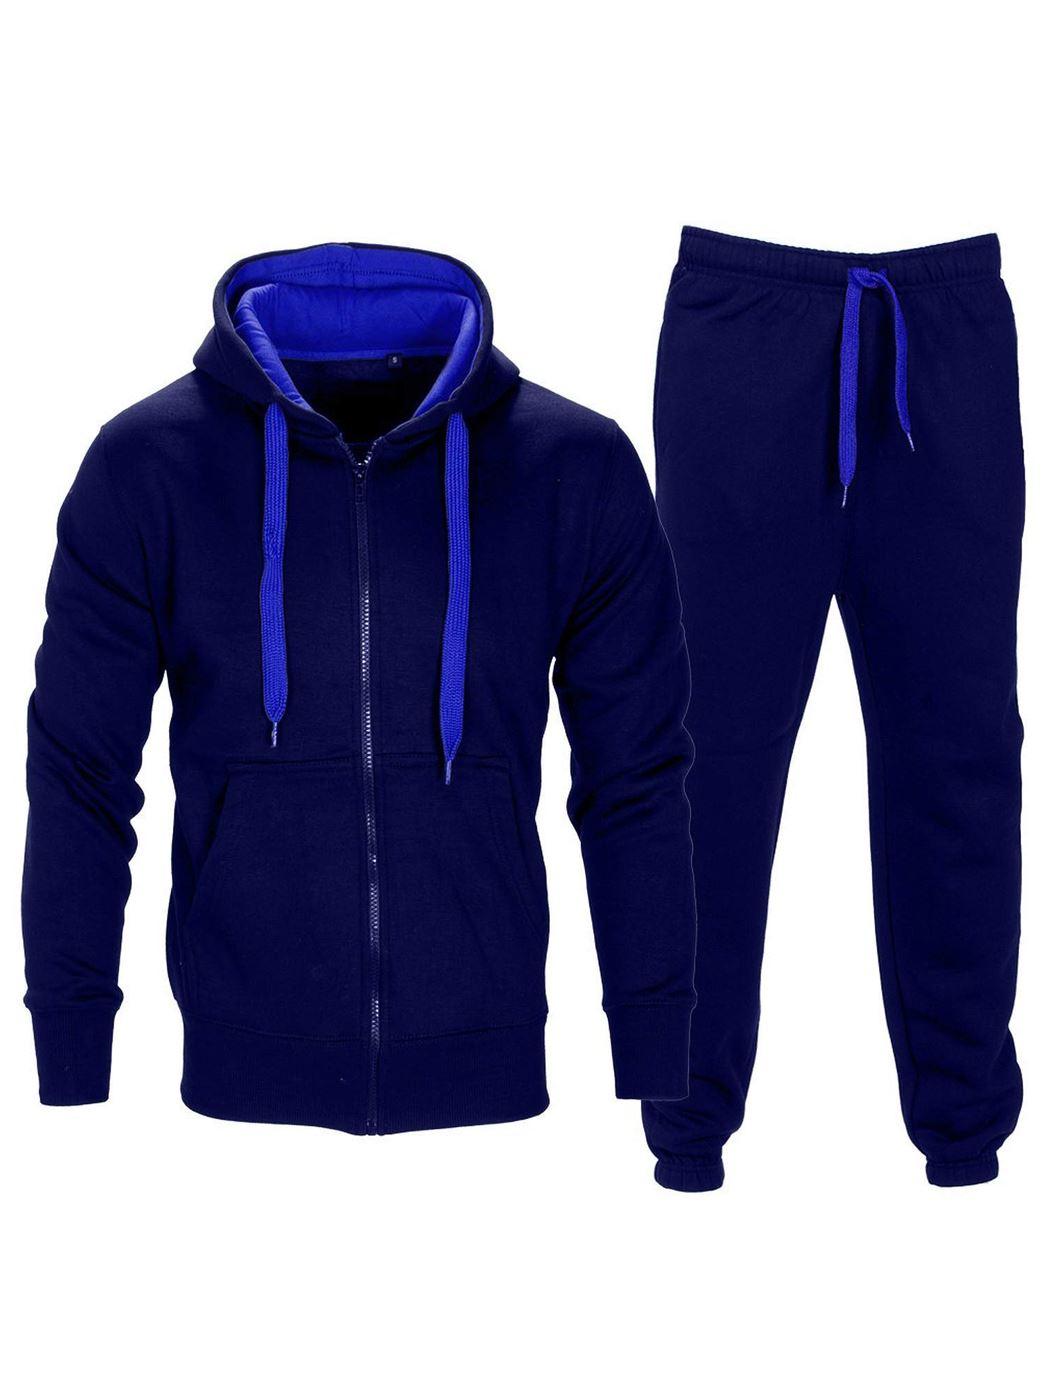 Mens Tracksuit Contrast Fleece Hooded Front Pocket Long Sleeve Zip Up Top Bottom